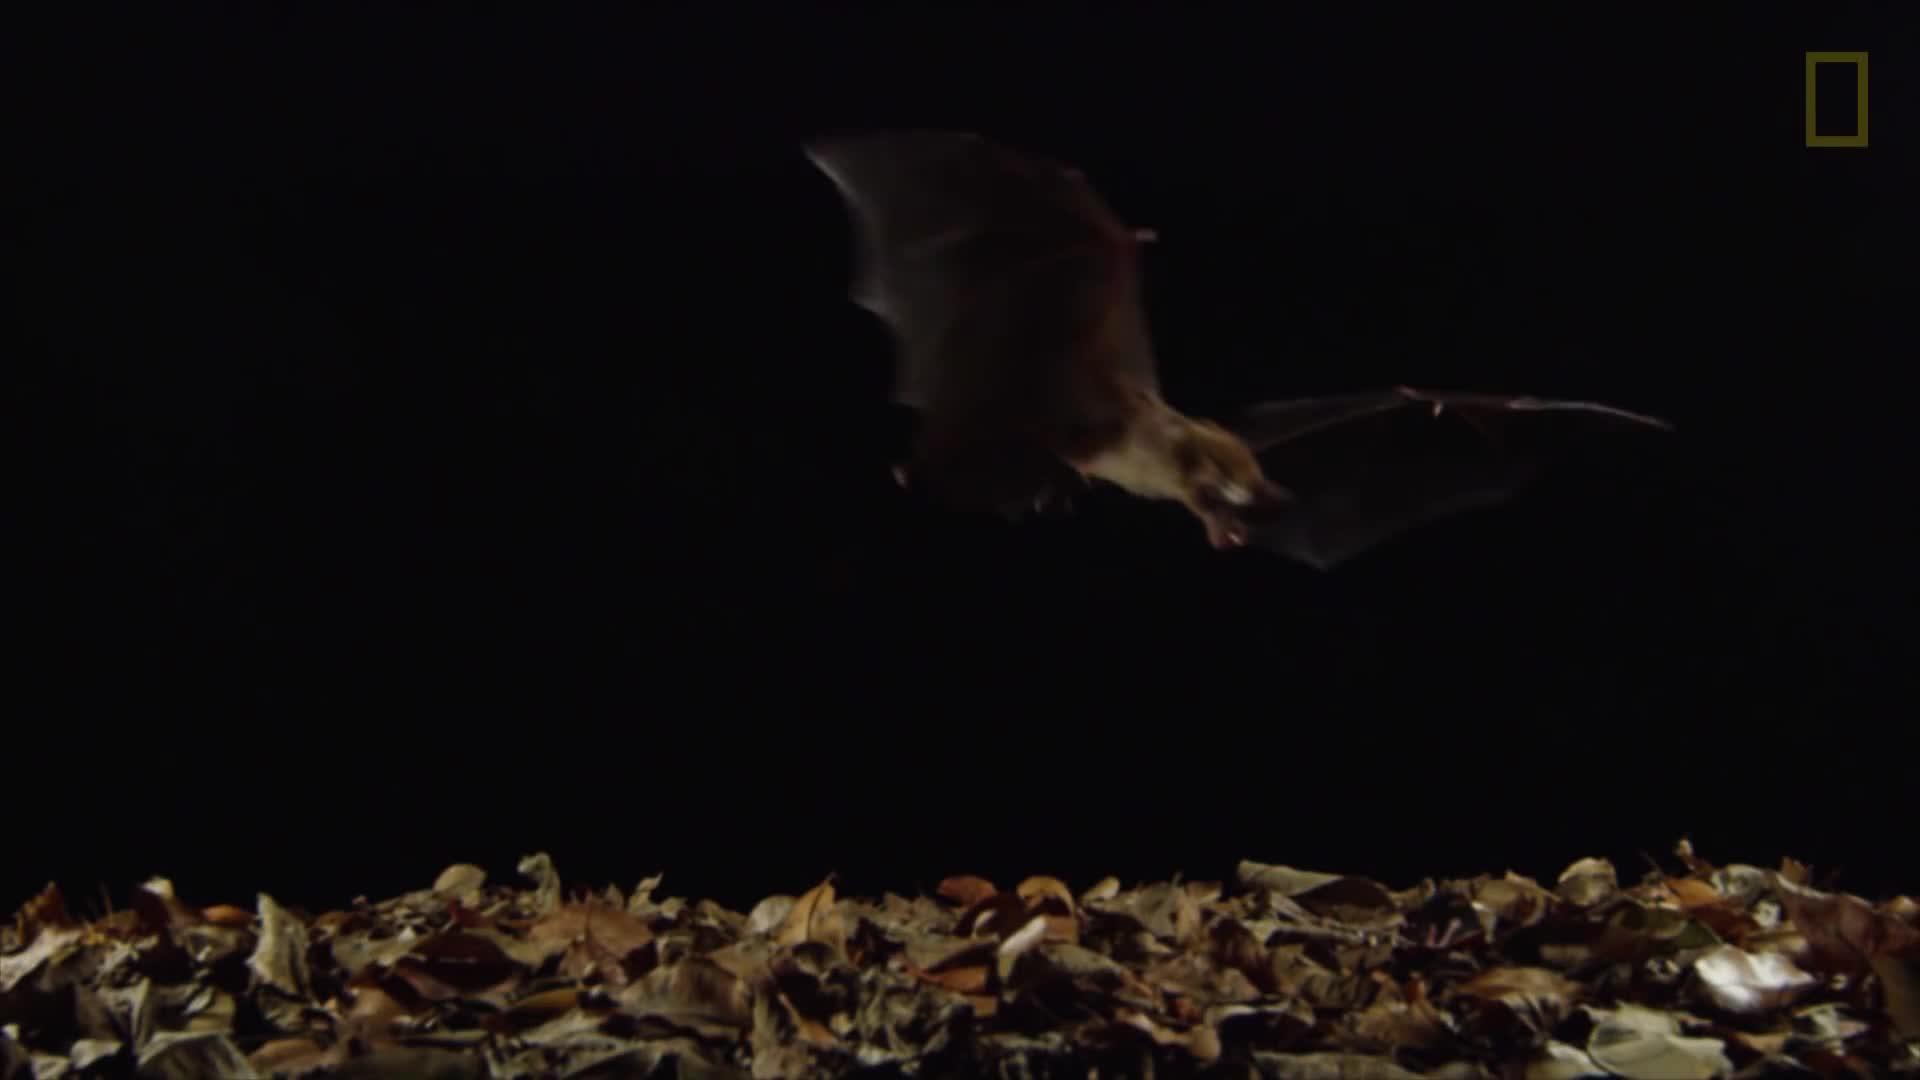 Capturing a Carnivorous Bat on Camera GIFs